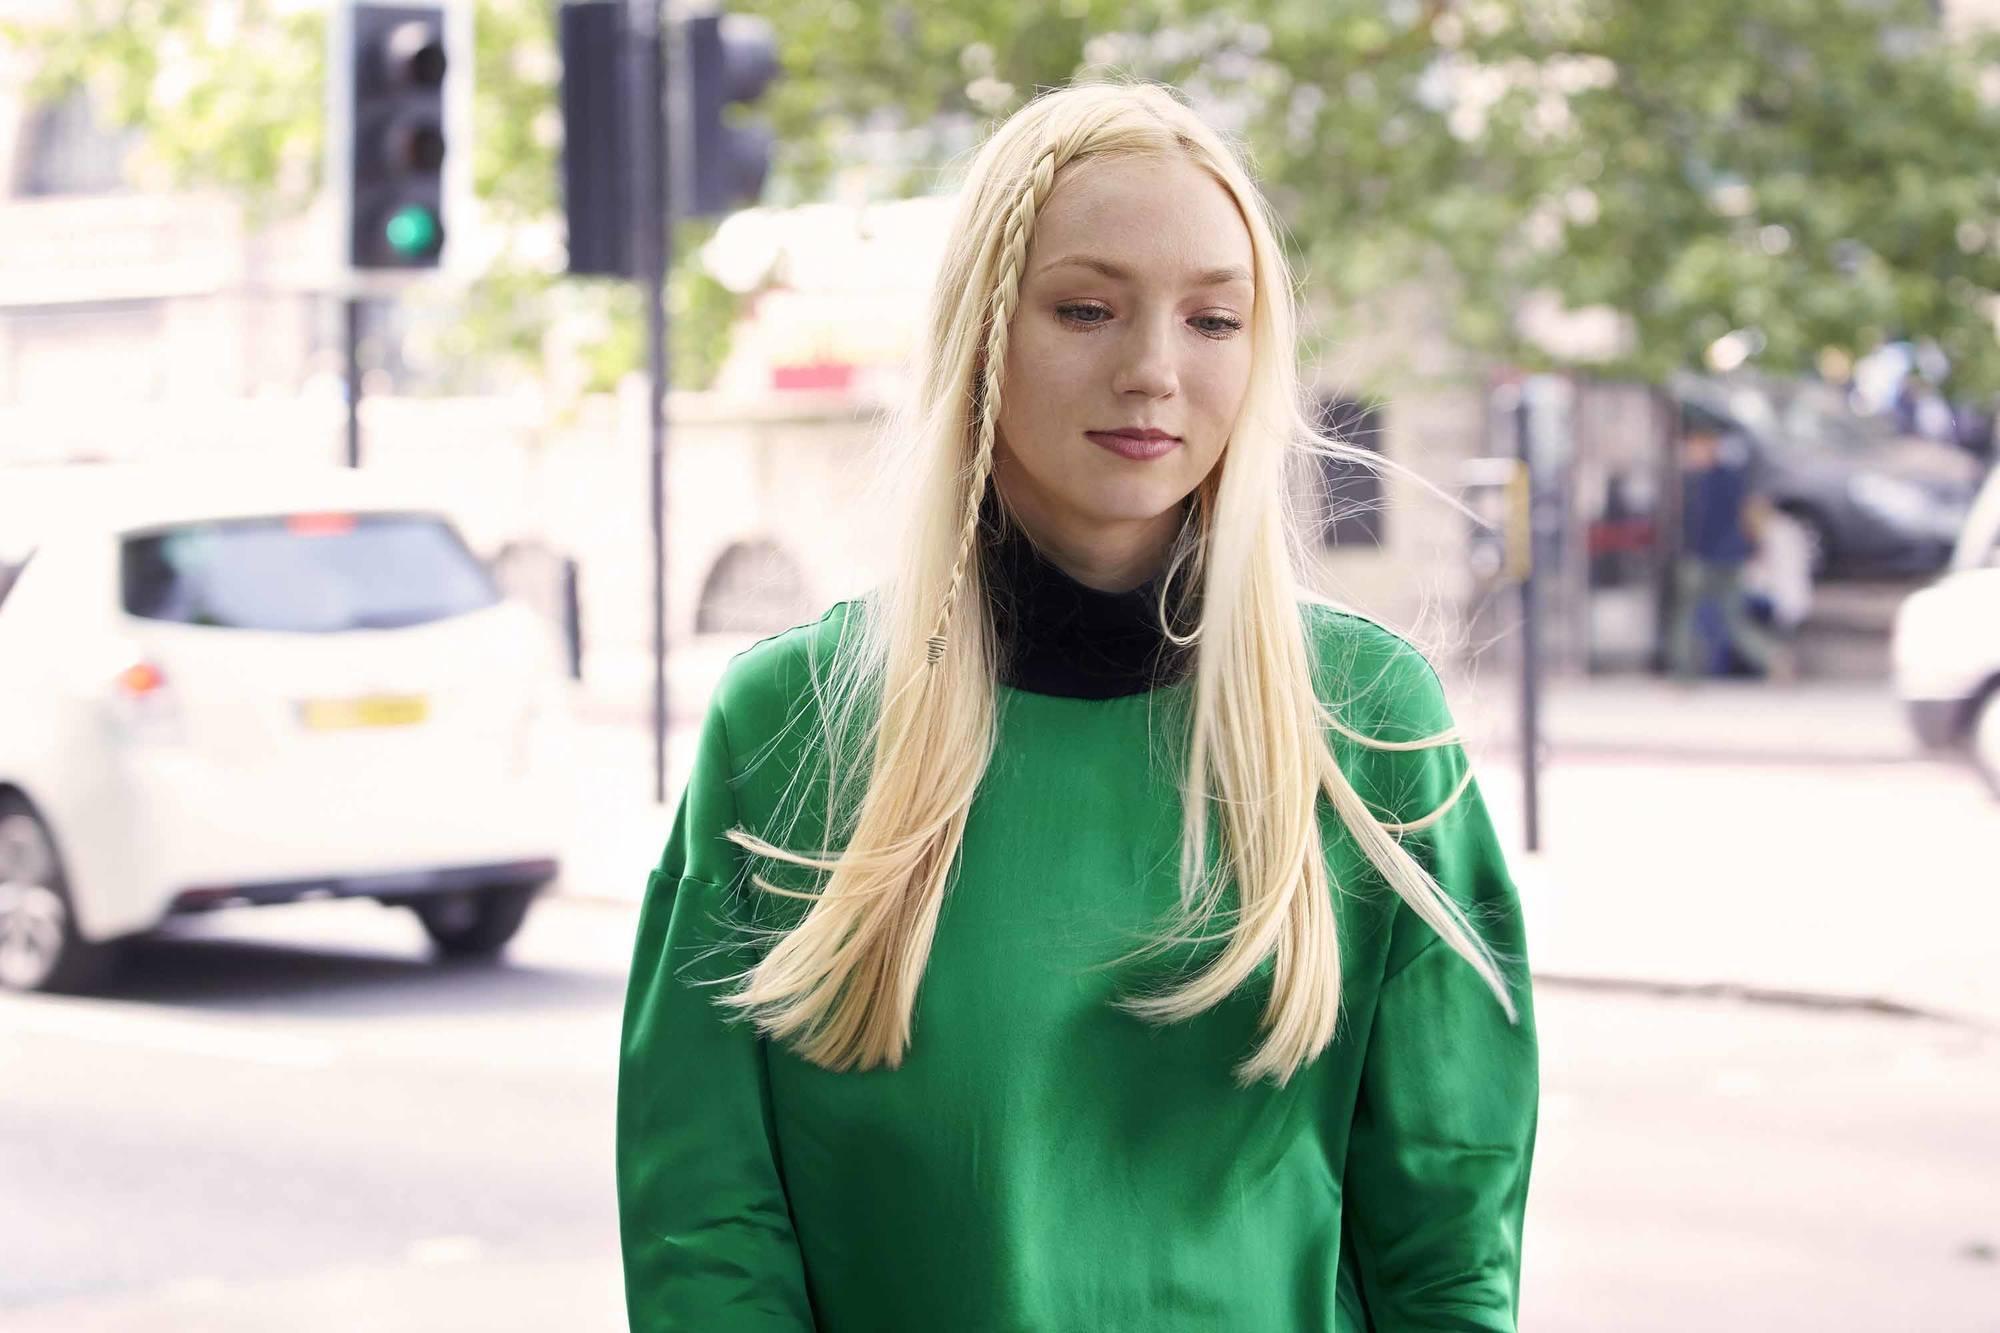 side braid hairstyles: skinny accent braid on blonde hair